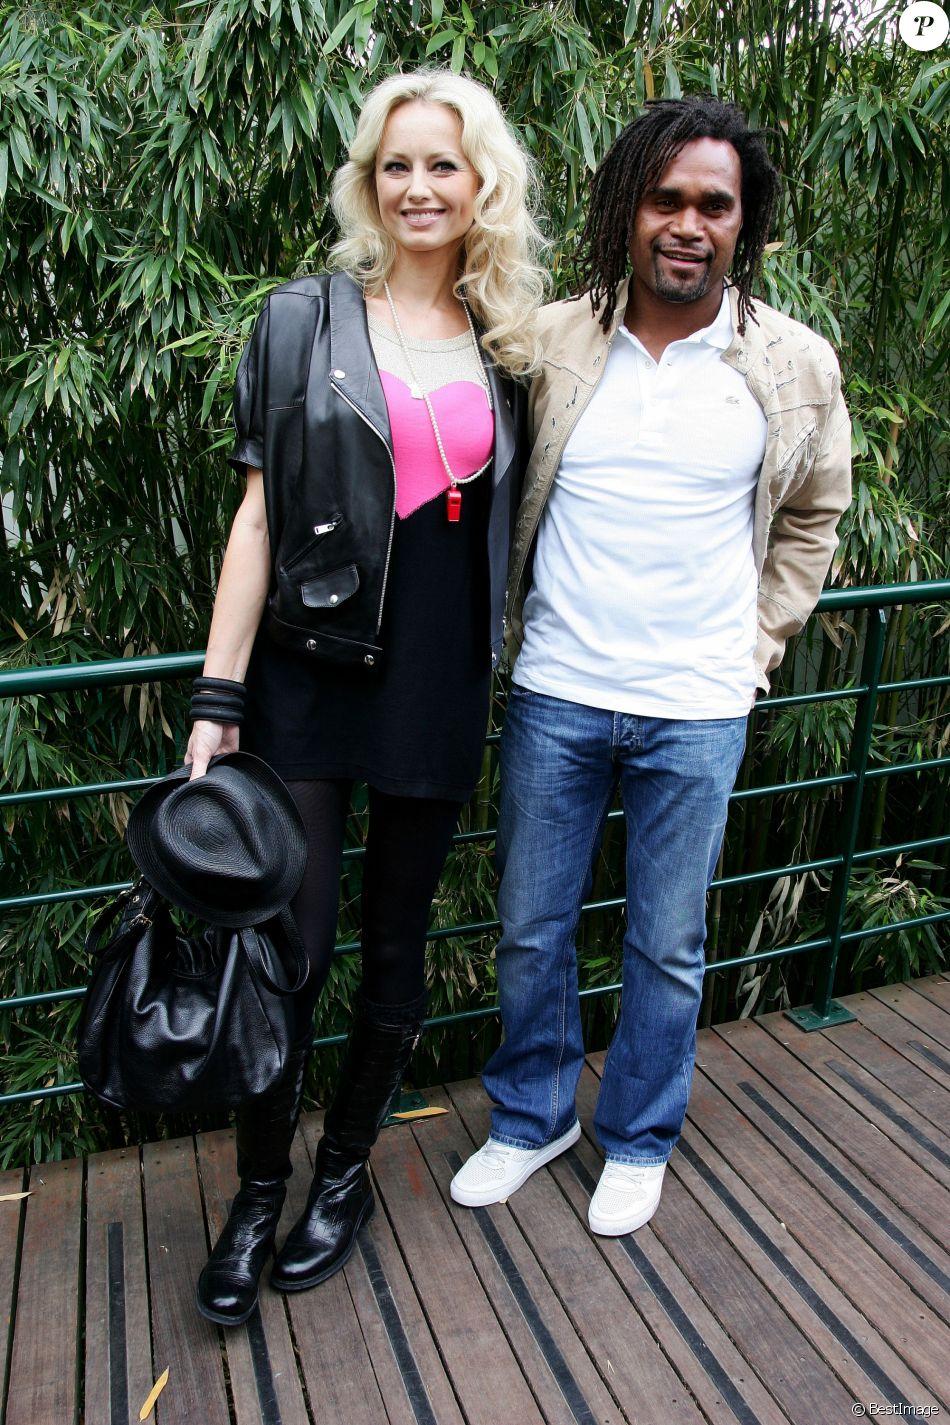 Christian Karembeu et sa femme Adriana Karembeu lors de la finale du tournoi de tennis de Roland Garros à Paris, le 6 juin 2010.